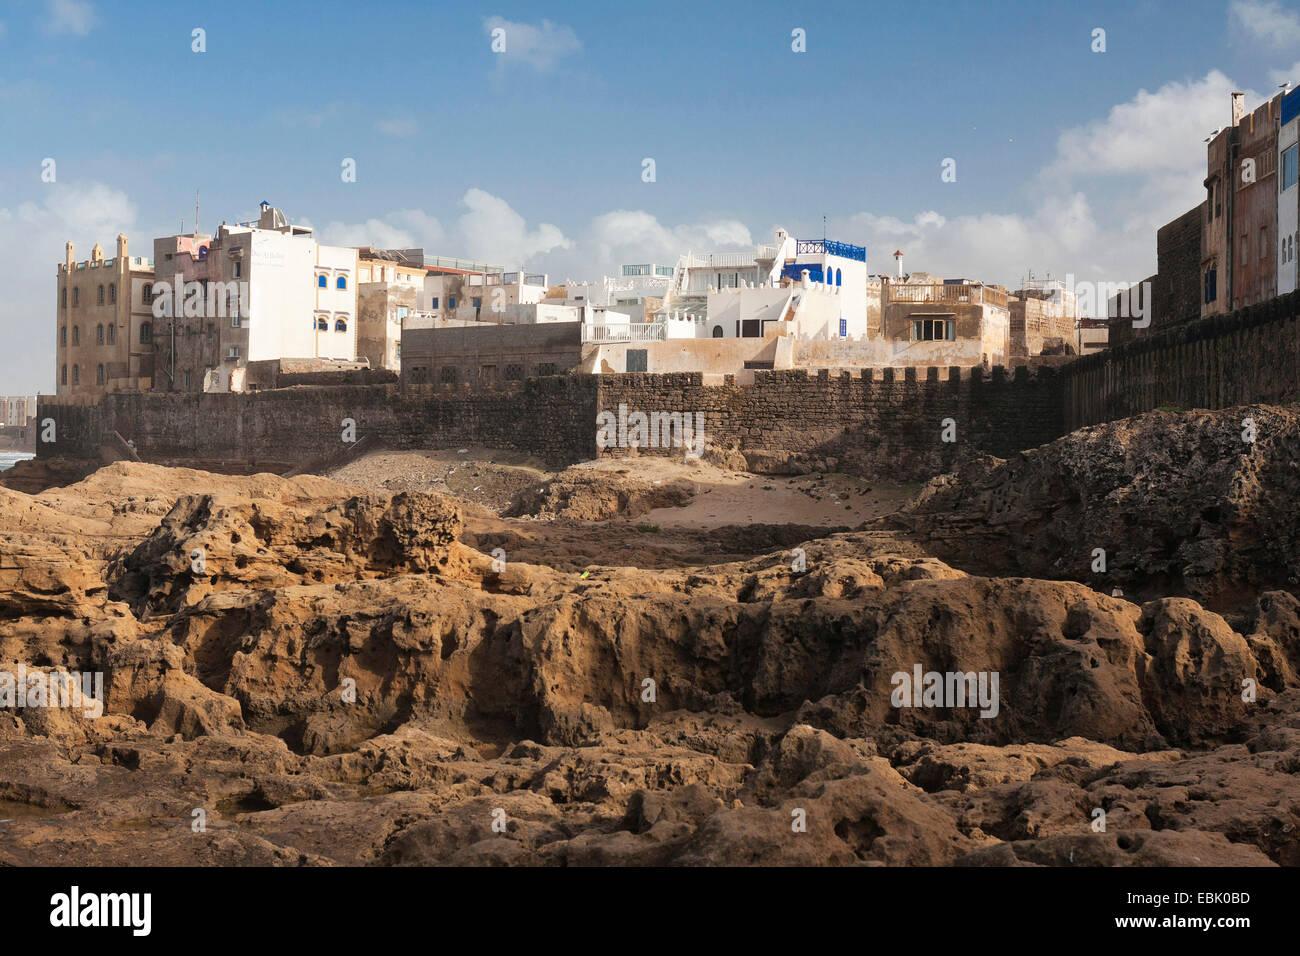 city wall of Essaouira, Morocco, Mauer, Essaouira - Stock Image